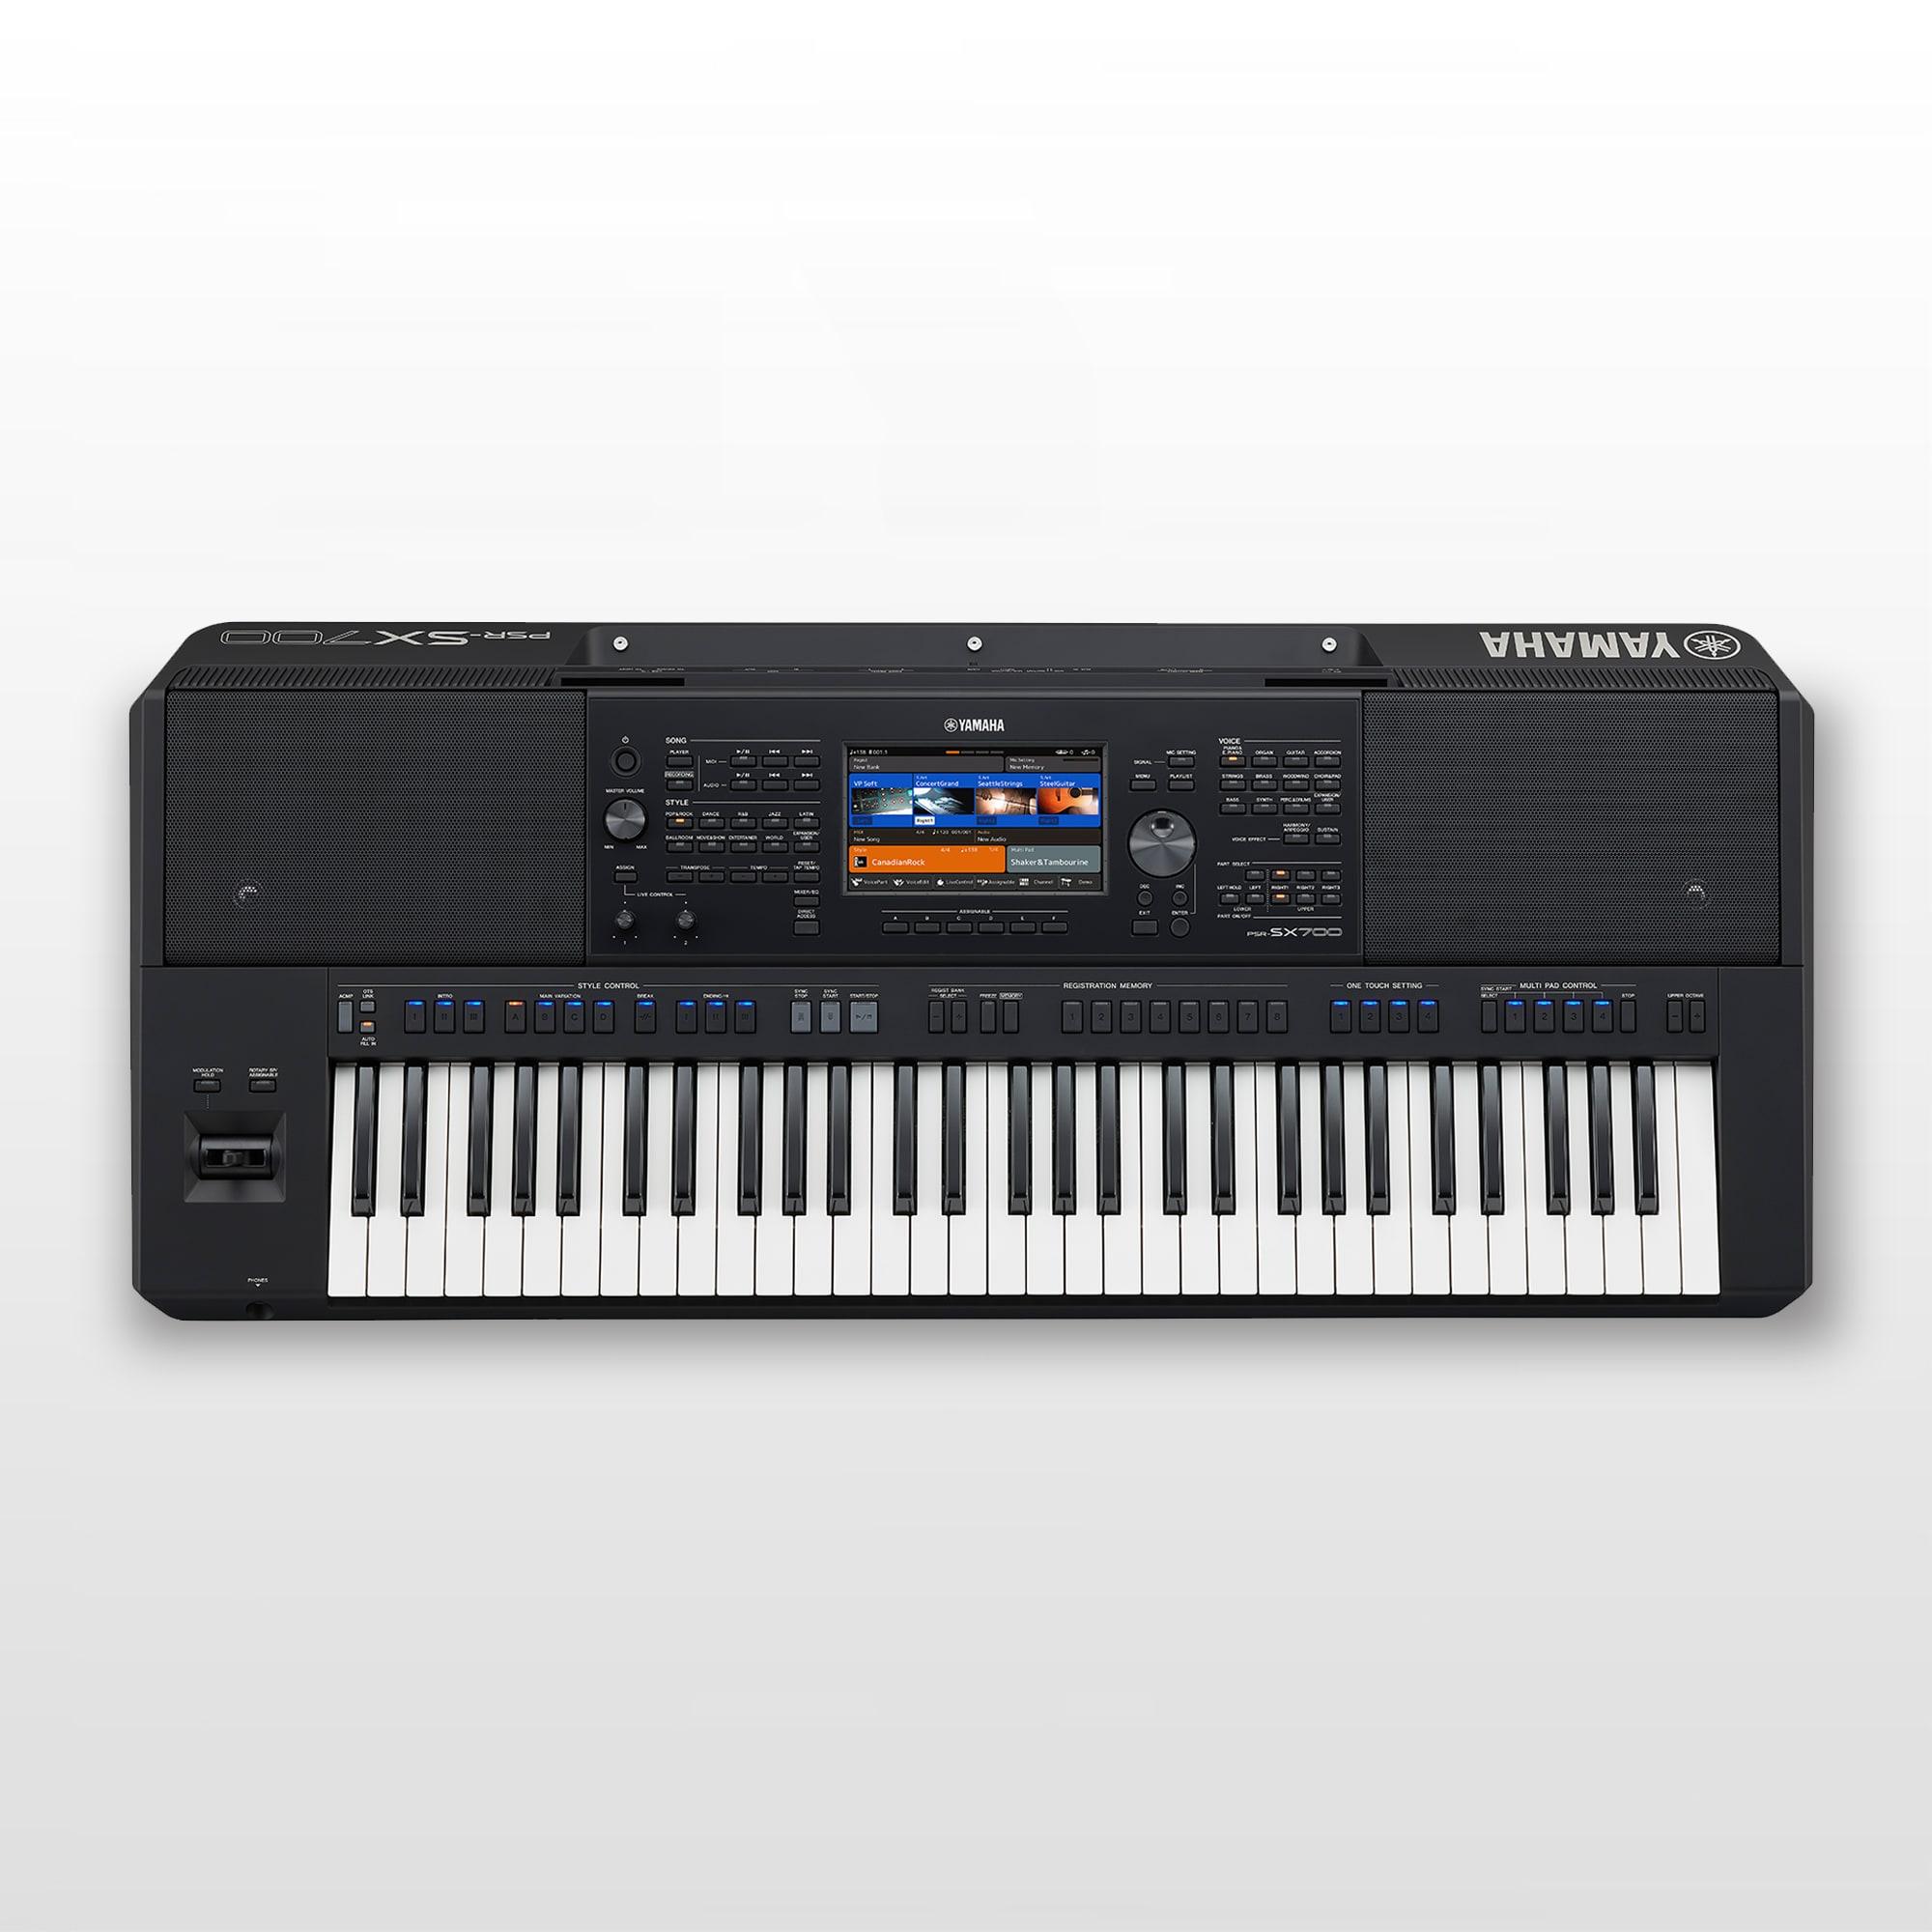 PSR-SX700 - Technische Daten - Digital Workstations - Keyboards ...